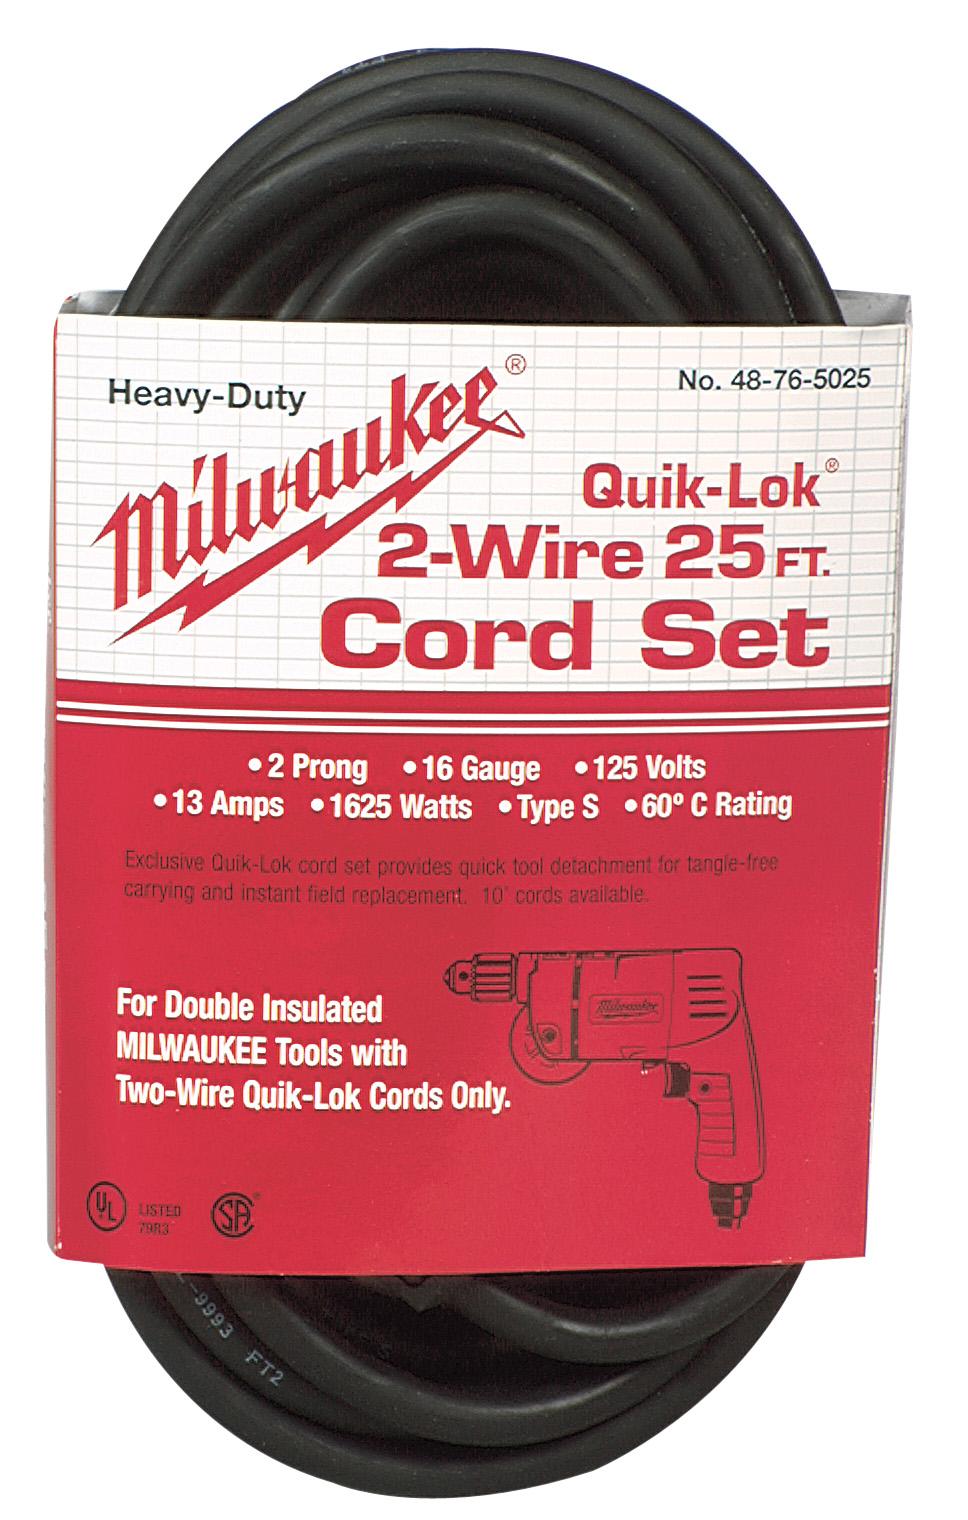 25 ft. 2-Wire QUIK-LOK Cord